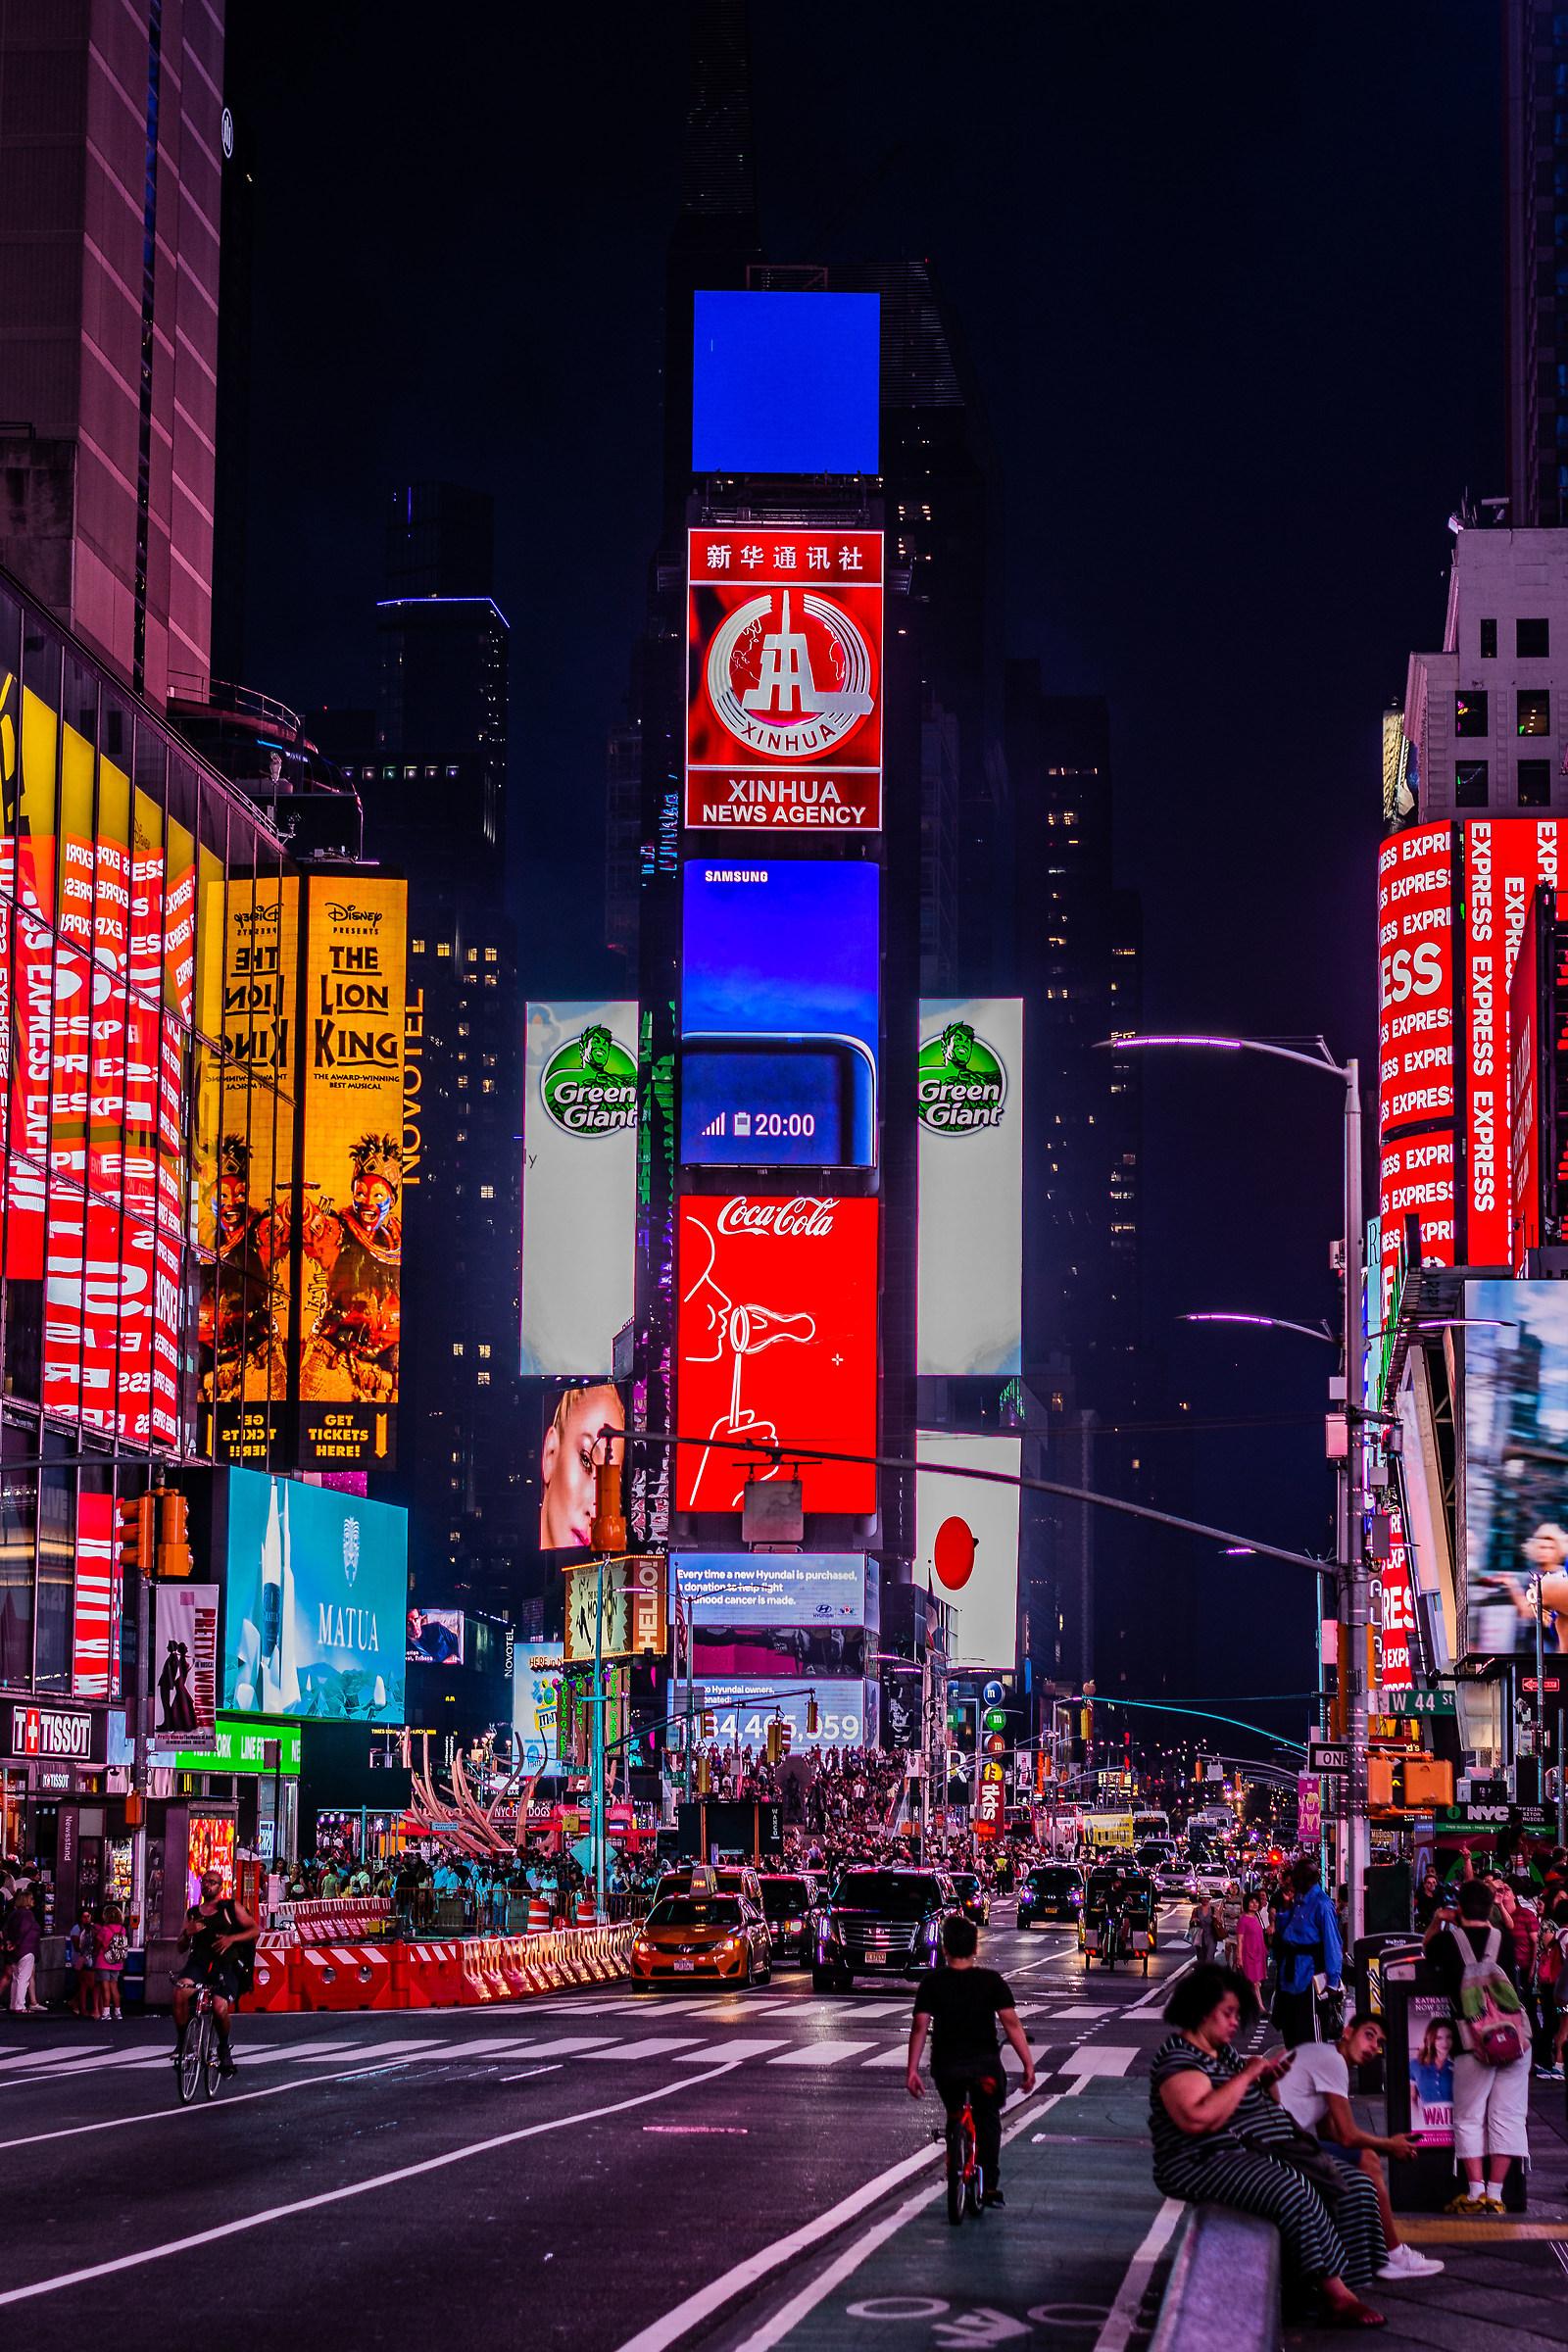 NEW YORK at night...